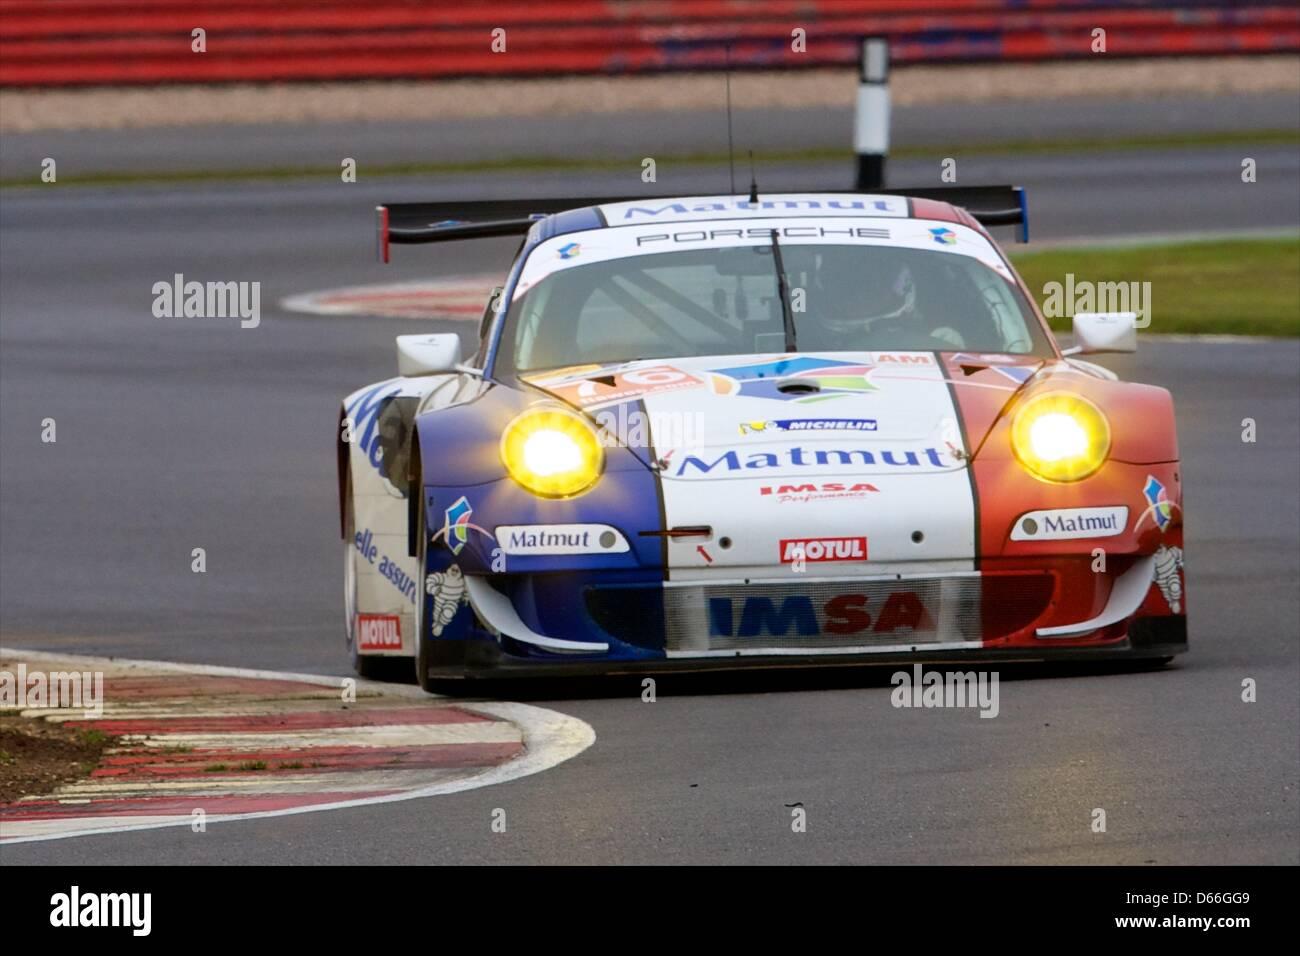 13.04.2013 Silverstone, England. IMSA Performance Matmut LMGTE Am Porsche 911 GT3 RSR driven by Raymond Narac (FRA), Stock Photo